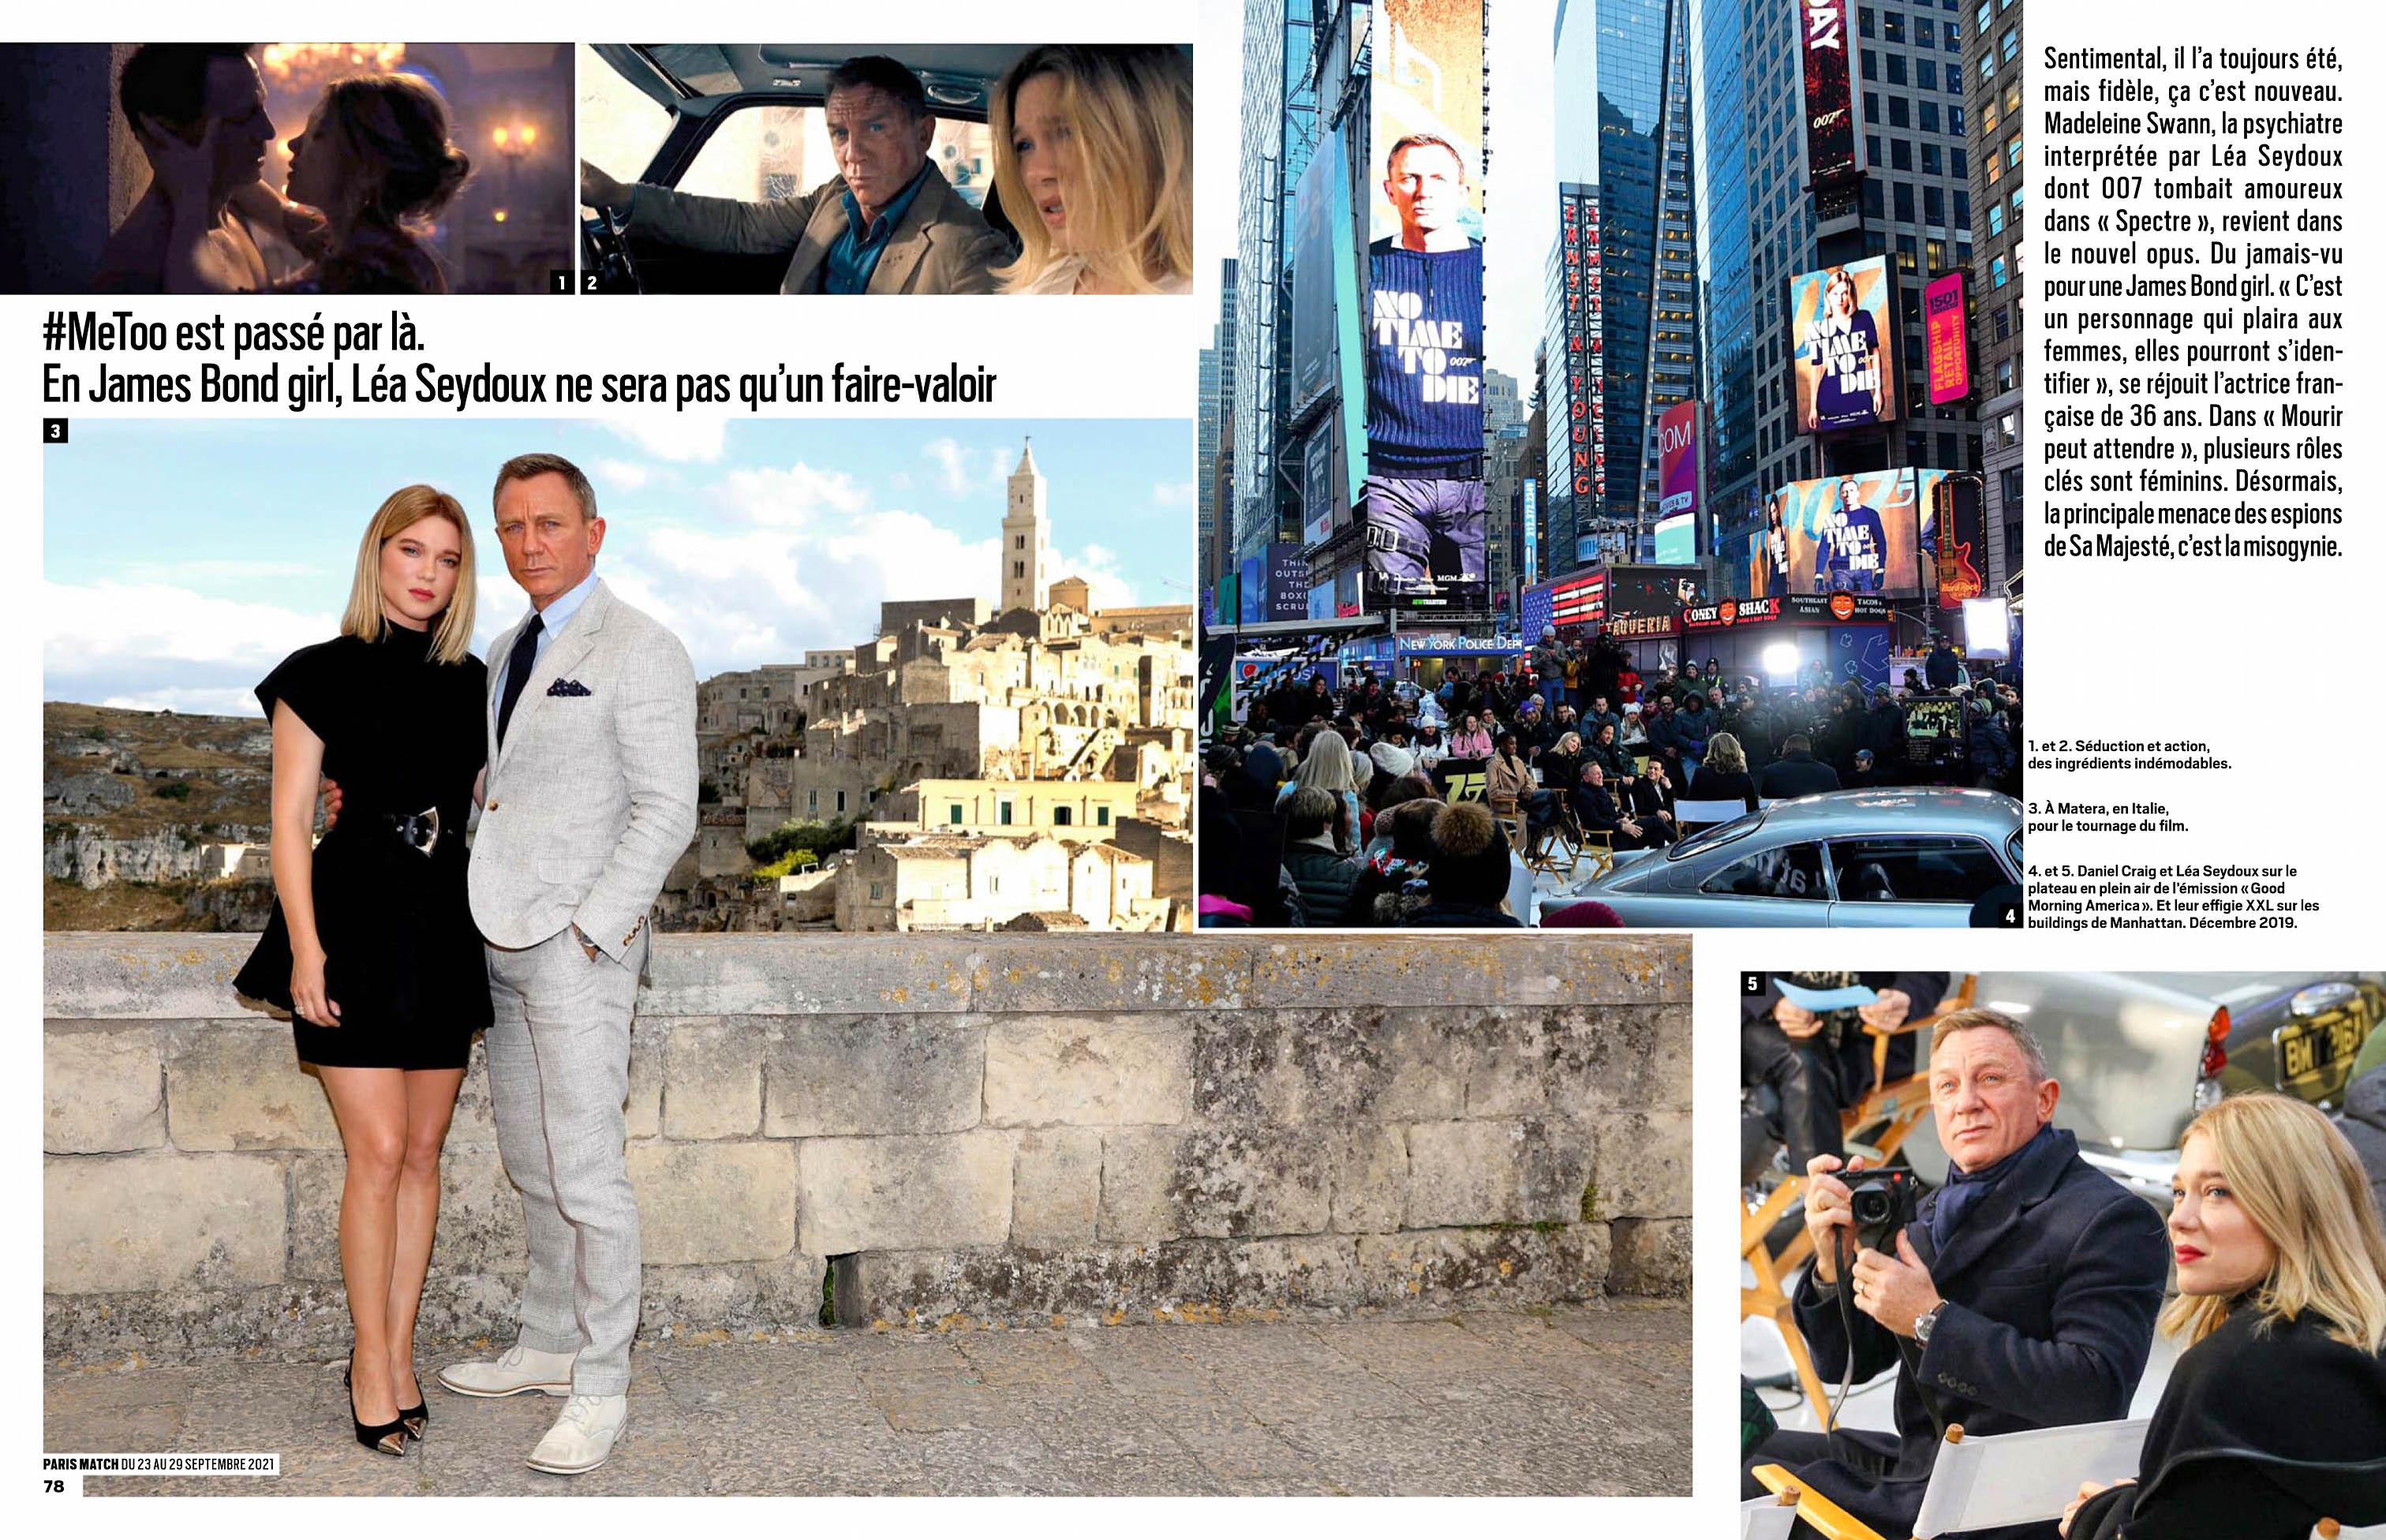 Paris Match 210923 Bond 02.jpg